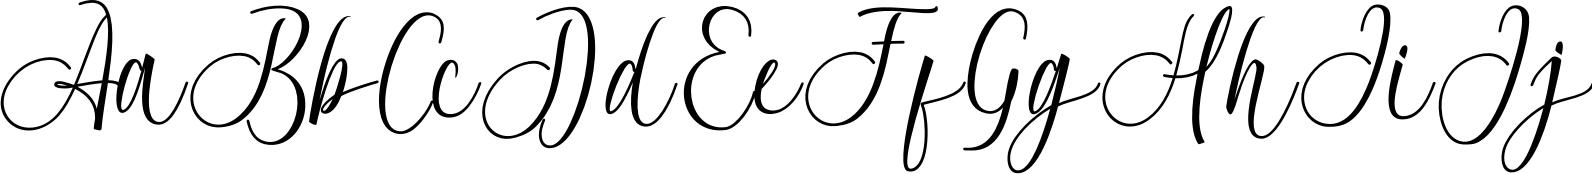 Acrobad Script